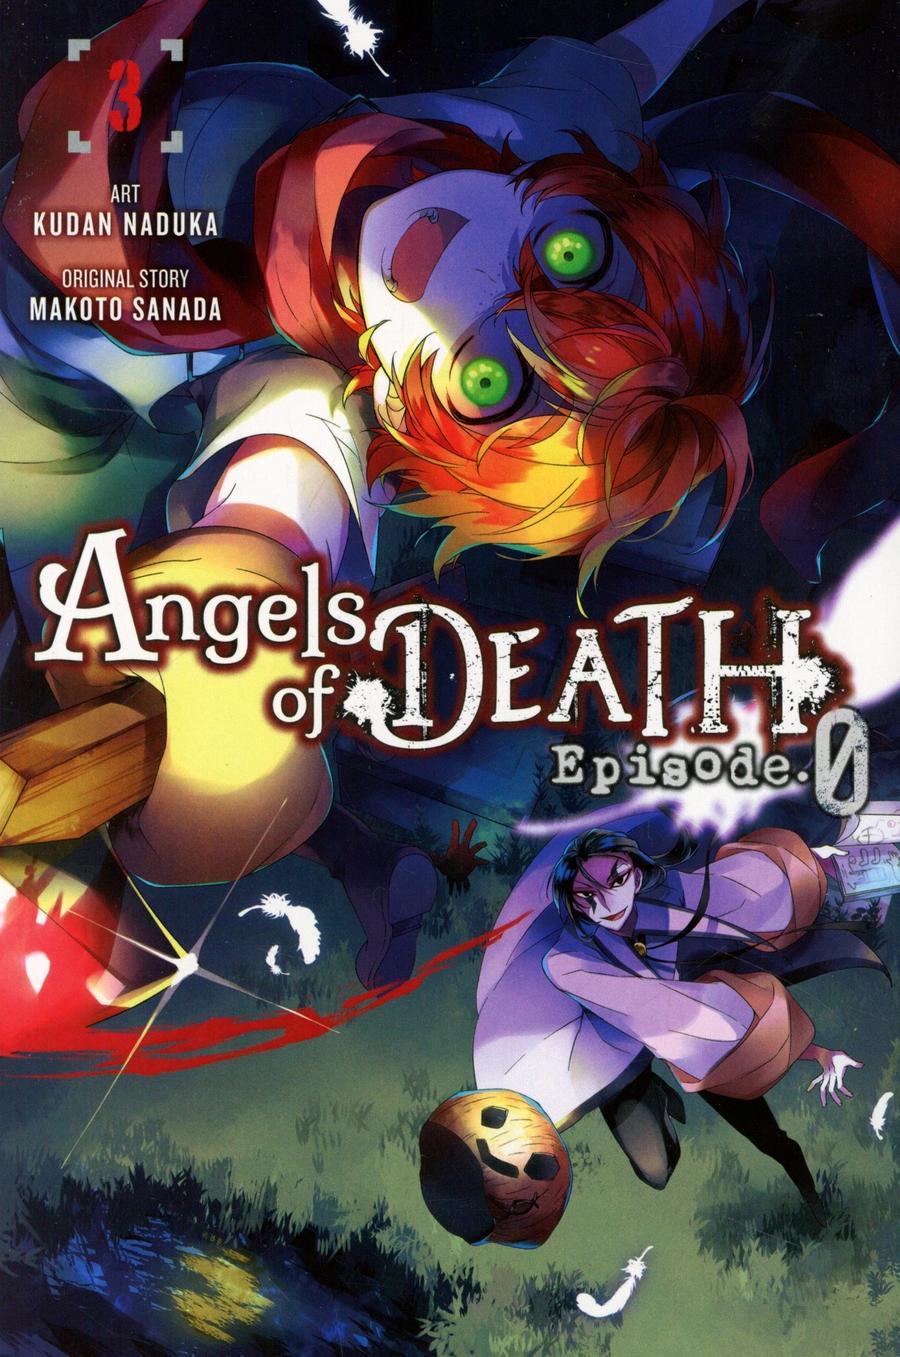 Angels Of Death Episode 0 Vol 3 GN